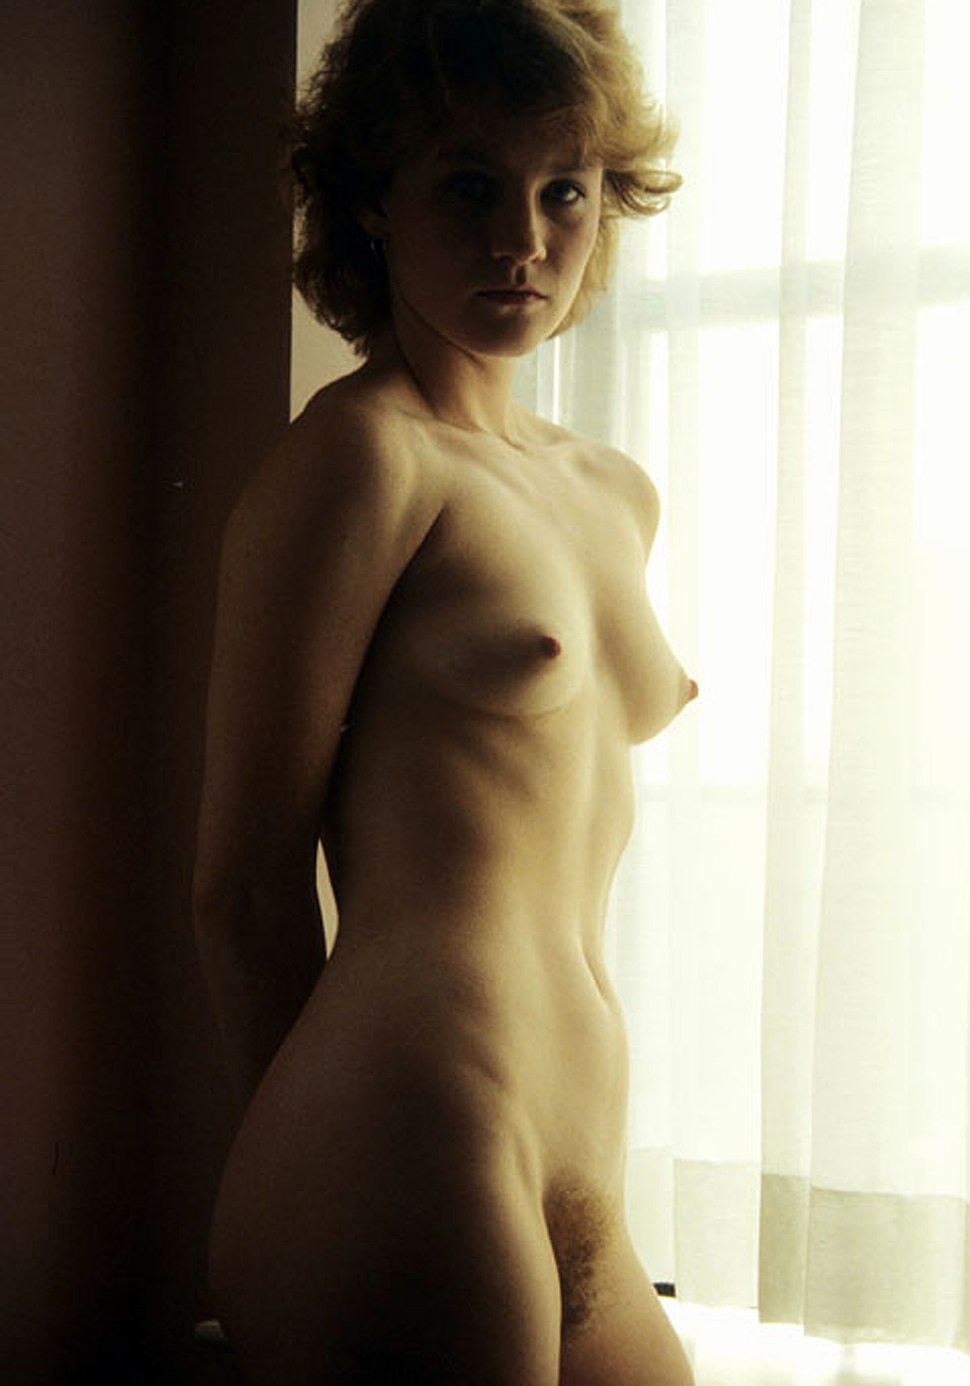 Nude blonde woman standing on window